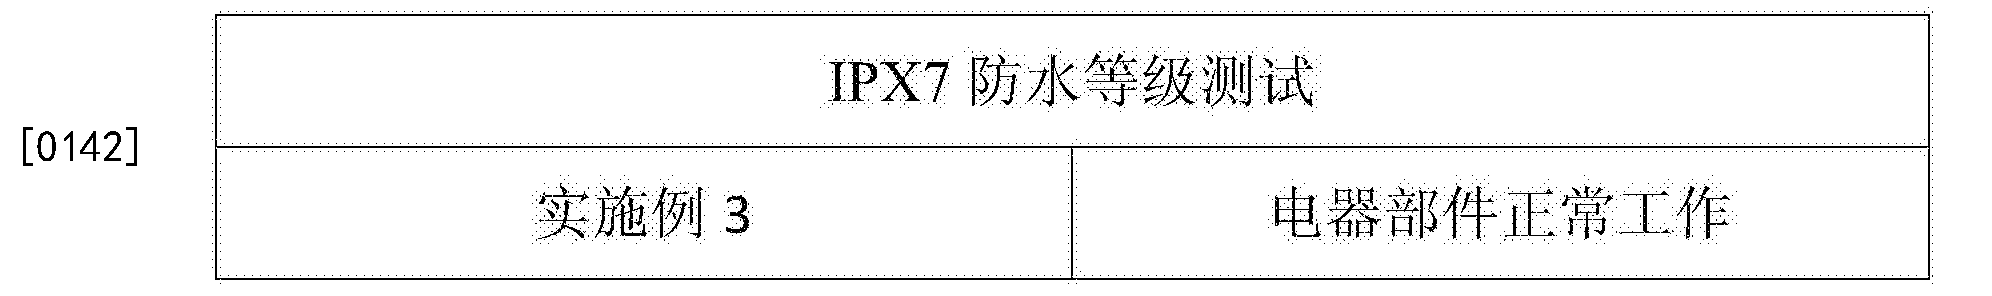 Figure CN107201510AD00152